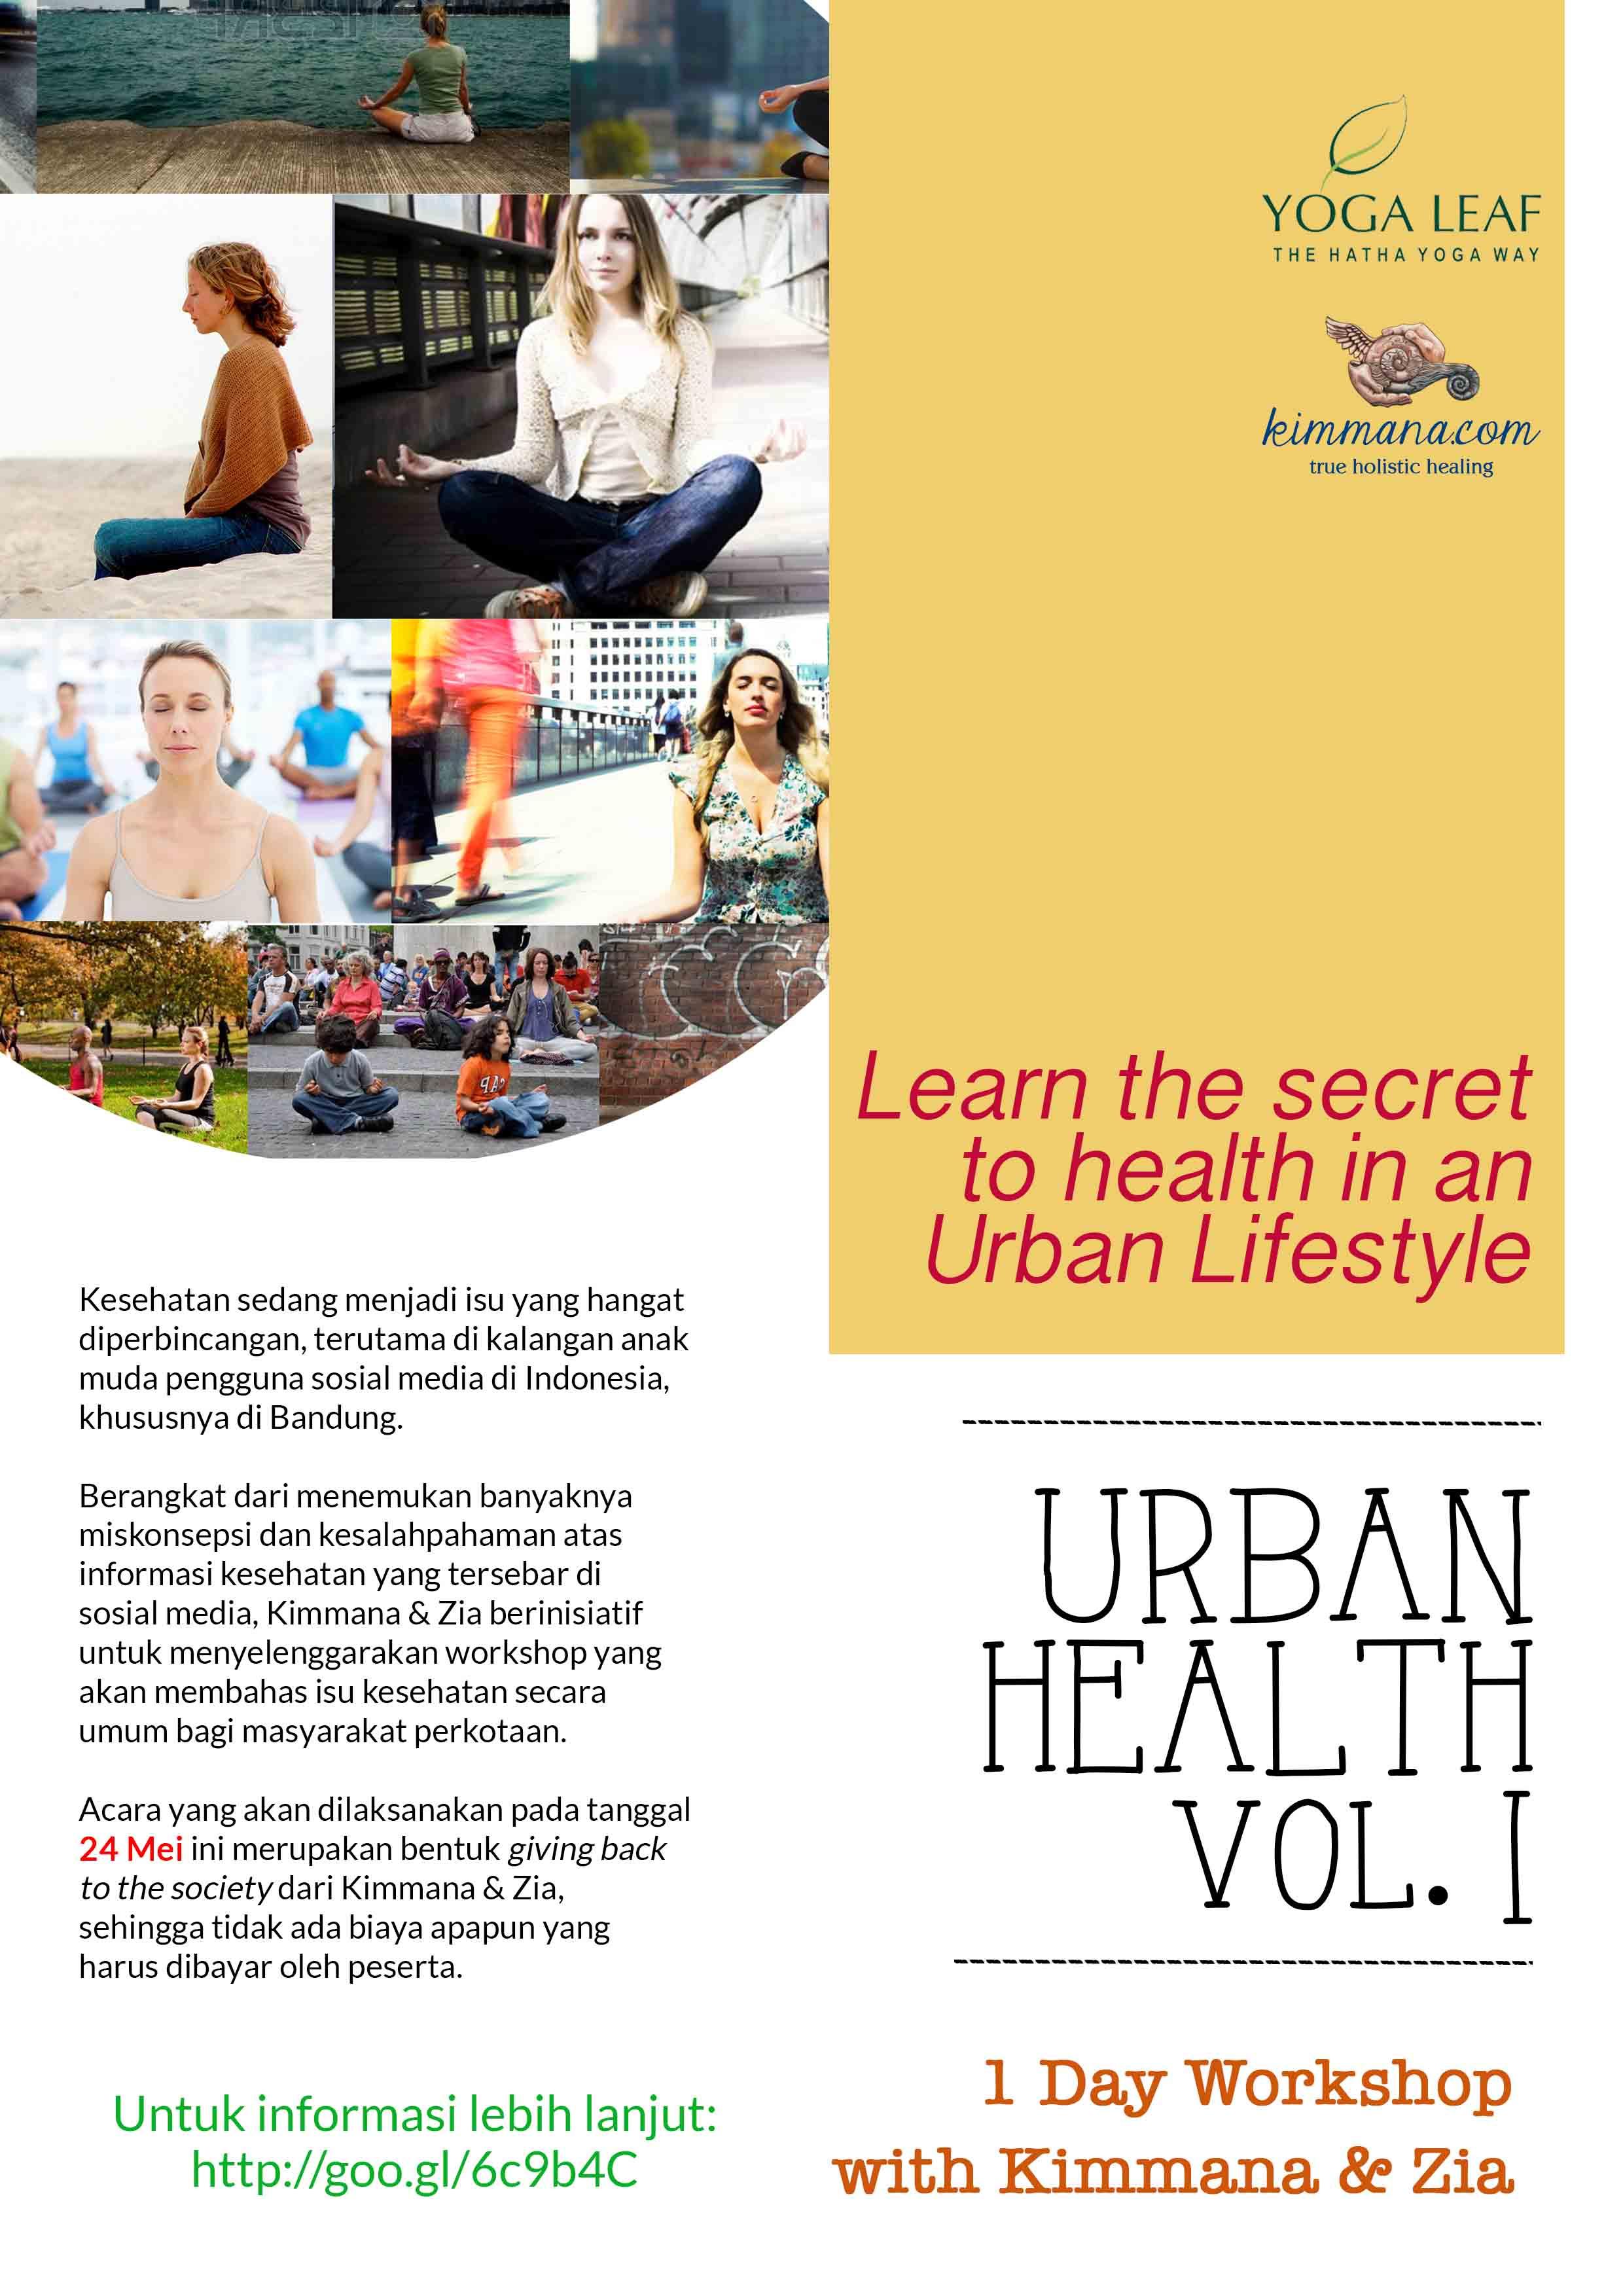 Urban Health Vol.1 – One Day Workshop by Kimmana & Zia